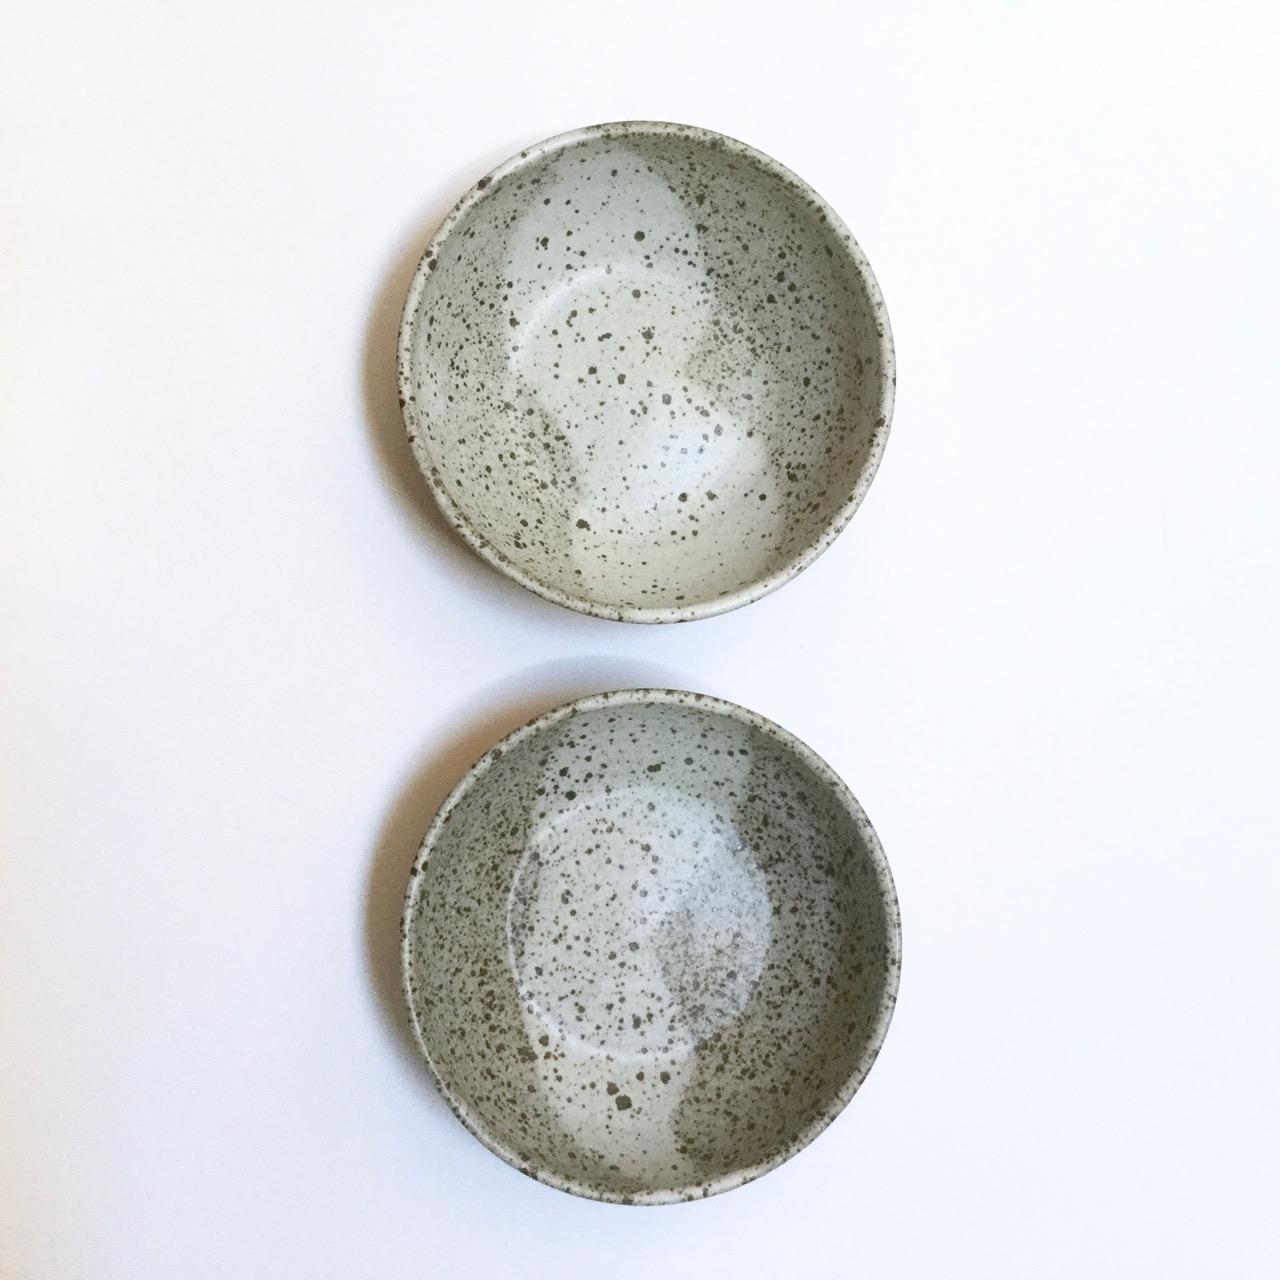 1146 Pair speckled bowls top.jpg